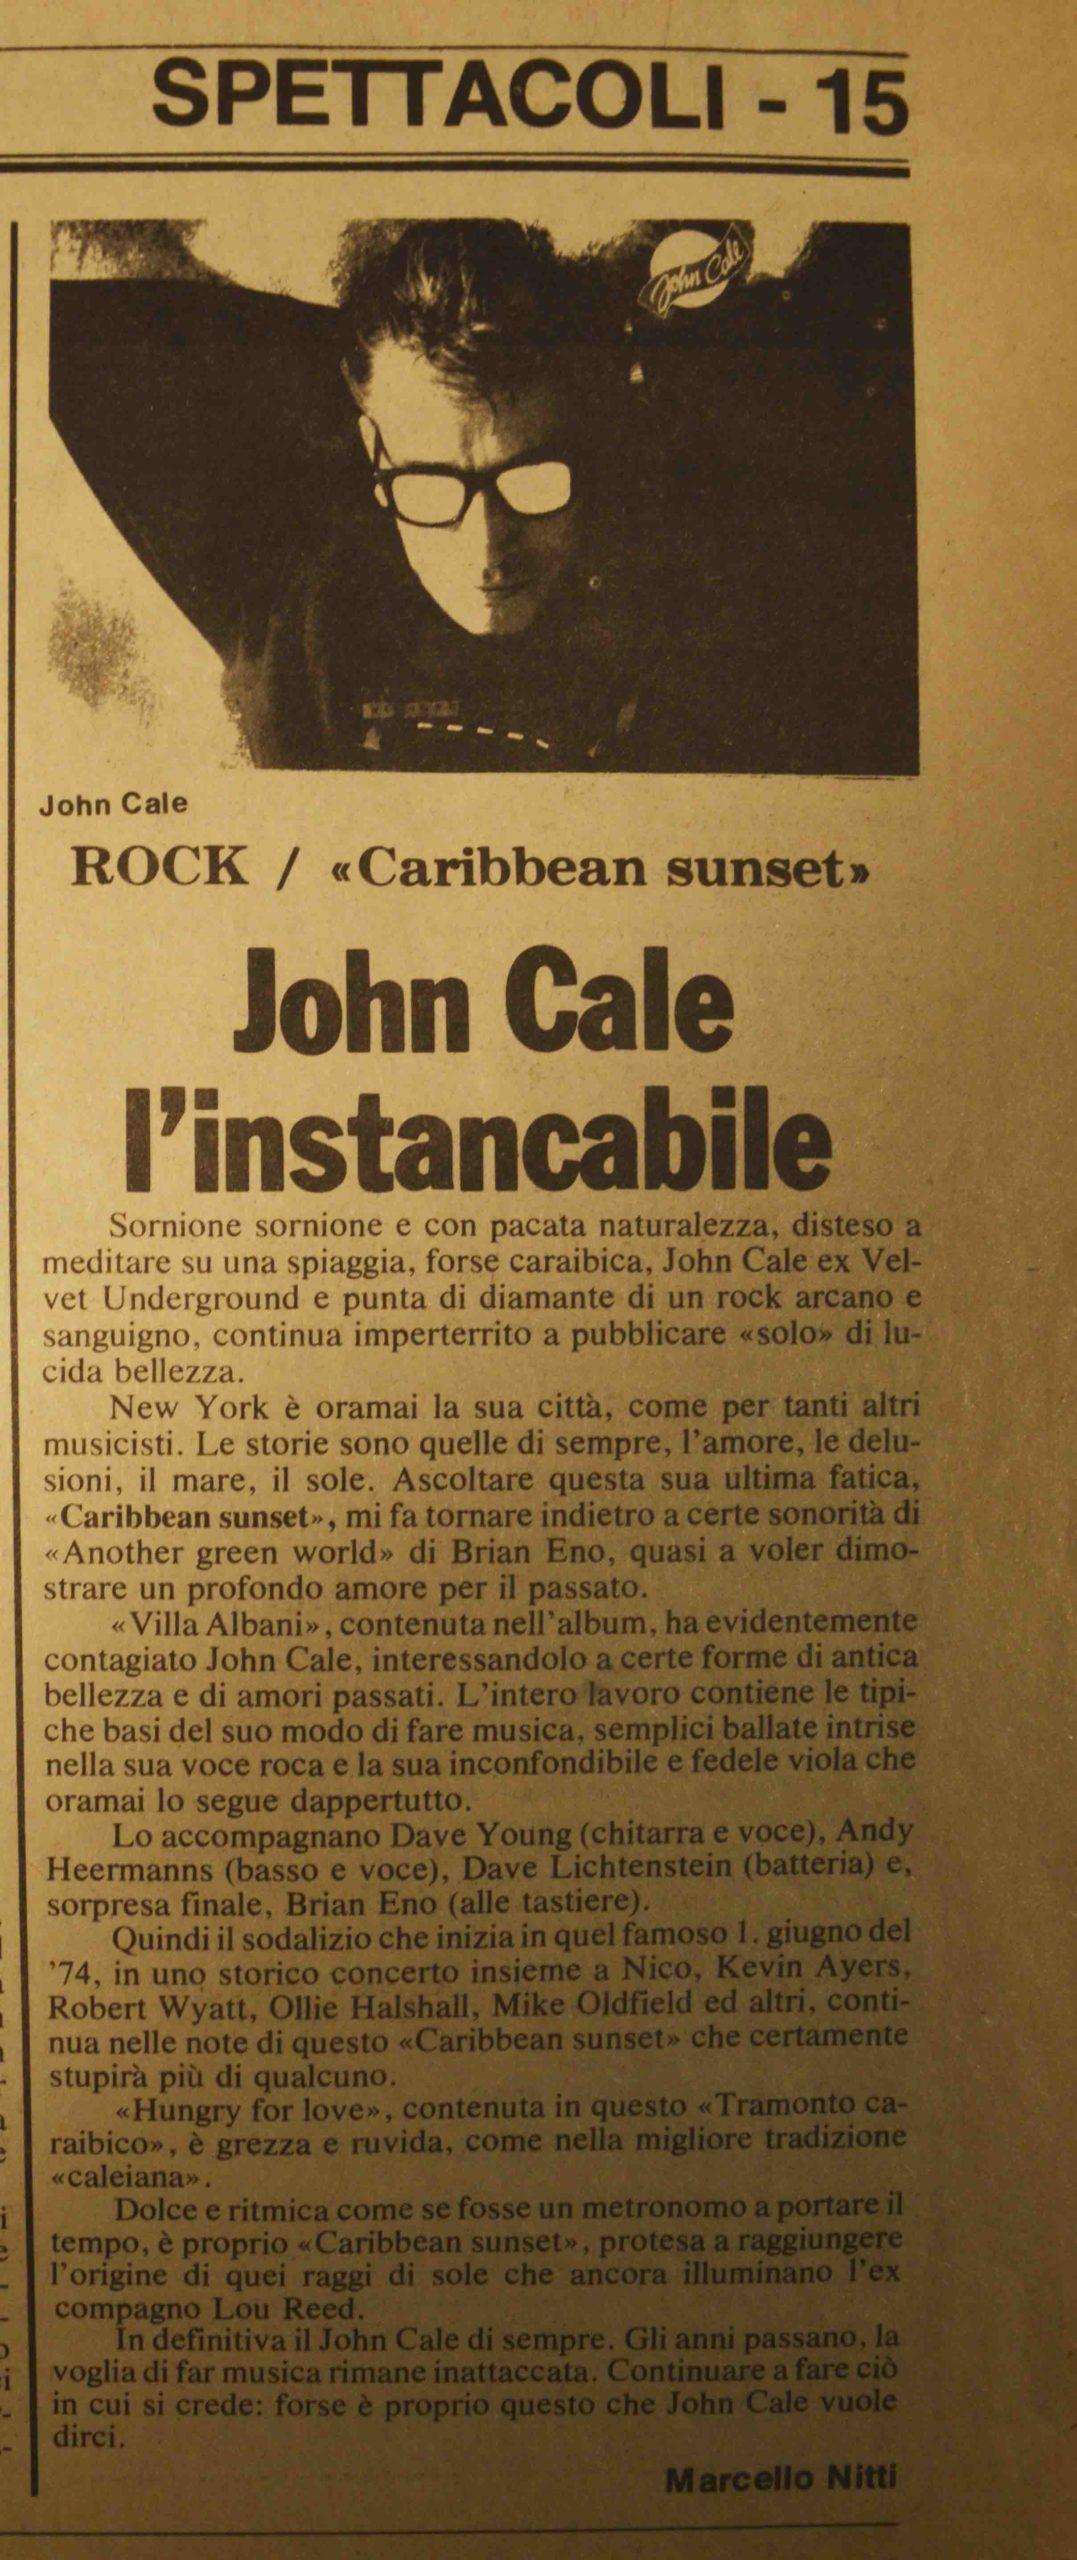 10.10.1984 John Cale l'instancabile